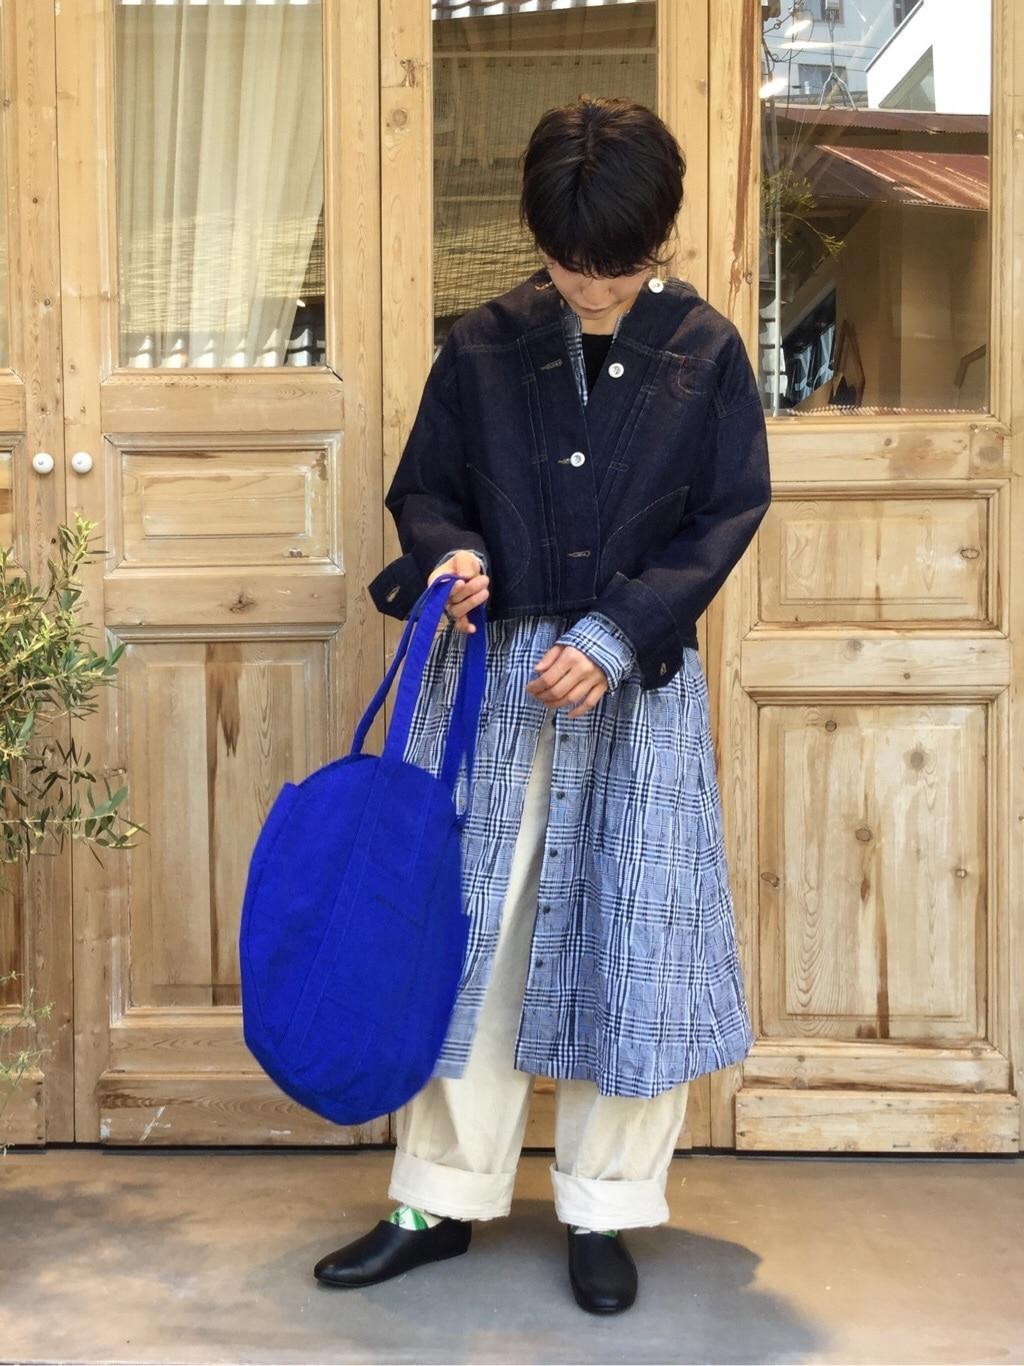 yuni / bulle de savon 京都路面 身長:158cm 2020.04.06